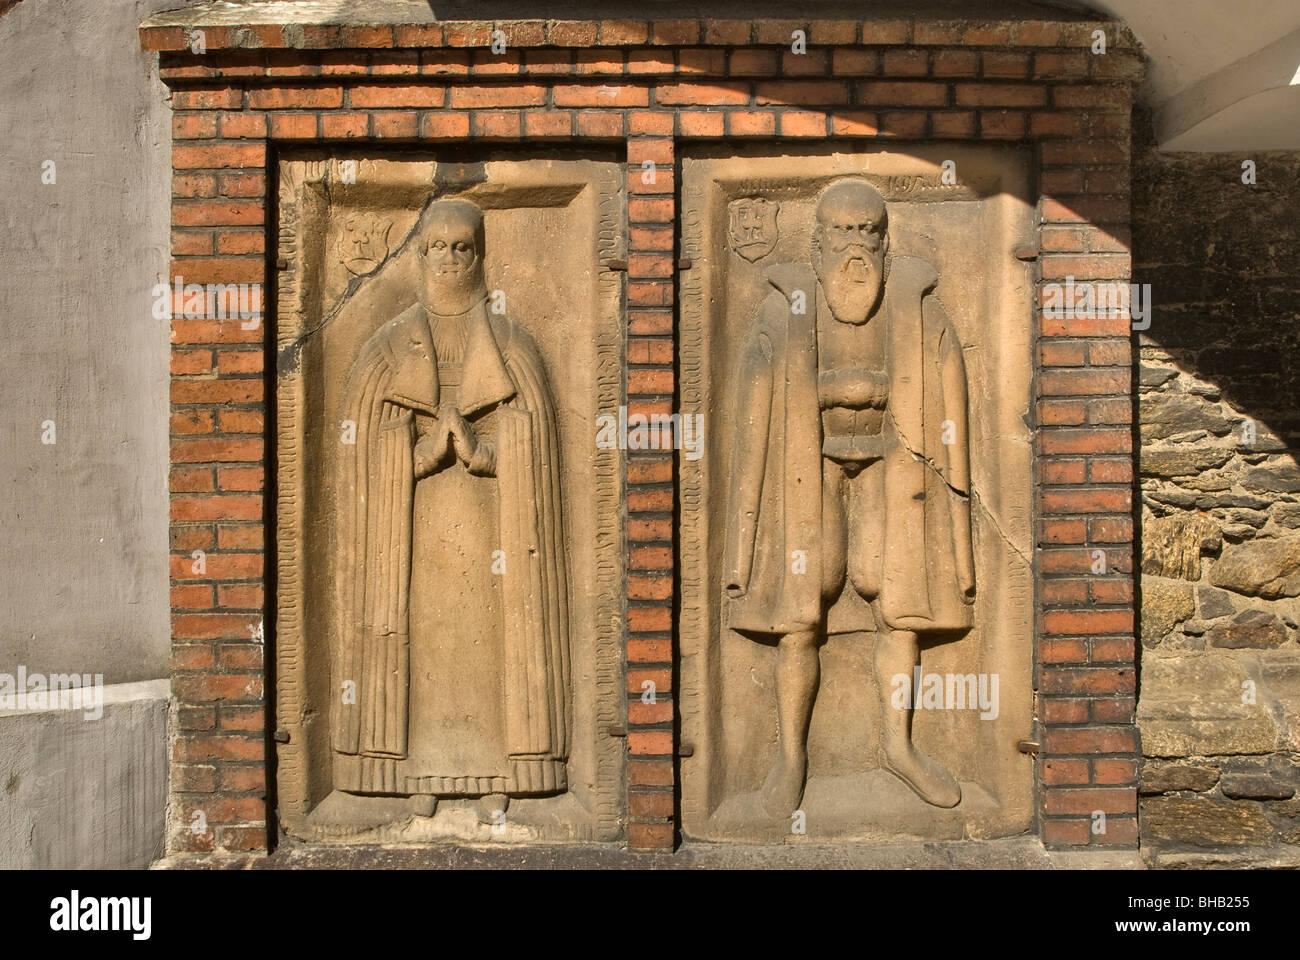 Epitaphs on wall of John the Evangelist Church in Paczków, Opolskie, Poland Stock Photo